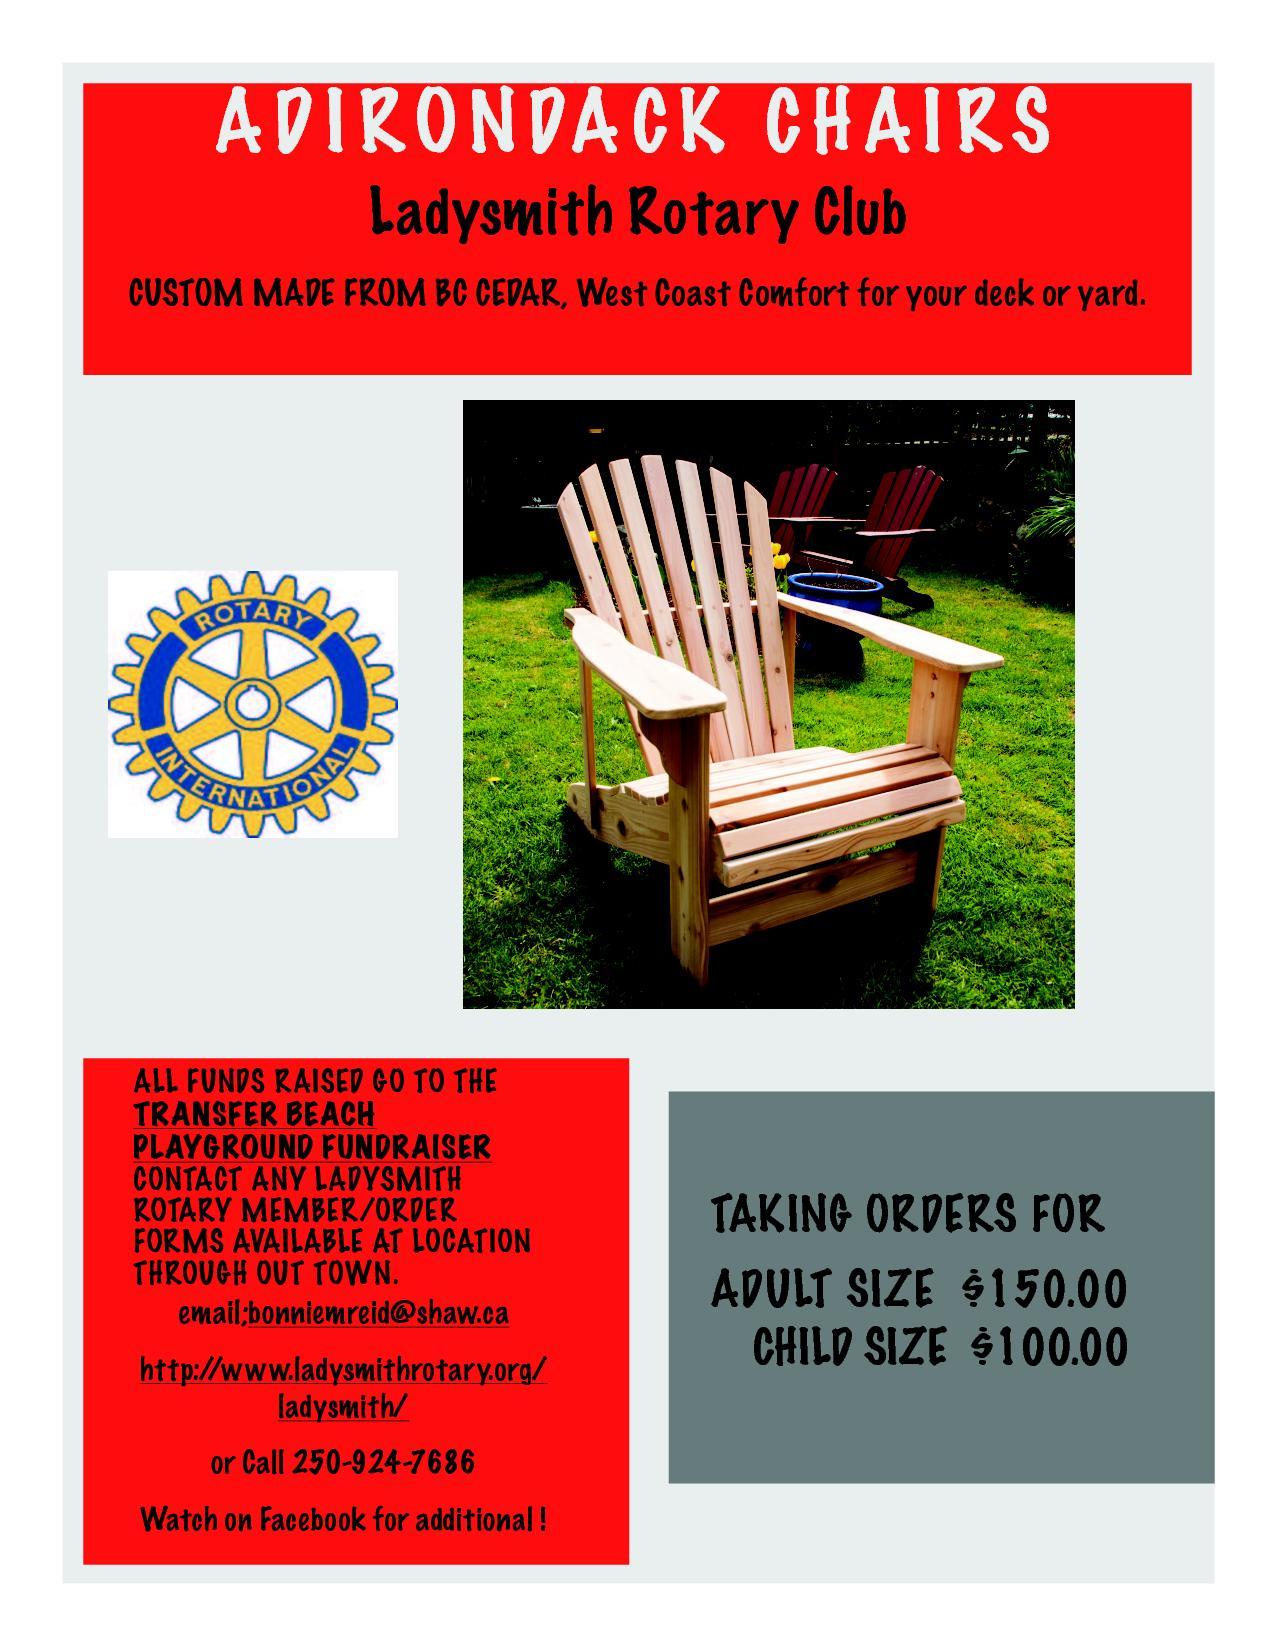 http://www.ladysmithcofc.com/wp-content/uploads/2015/04/Adirondack-Chair-Poster.pdf.jpg